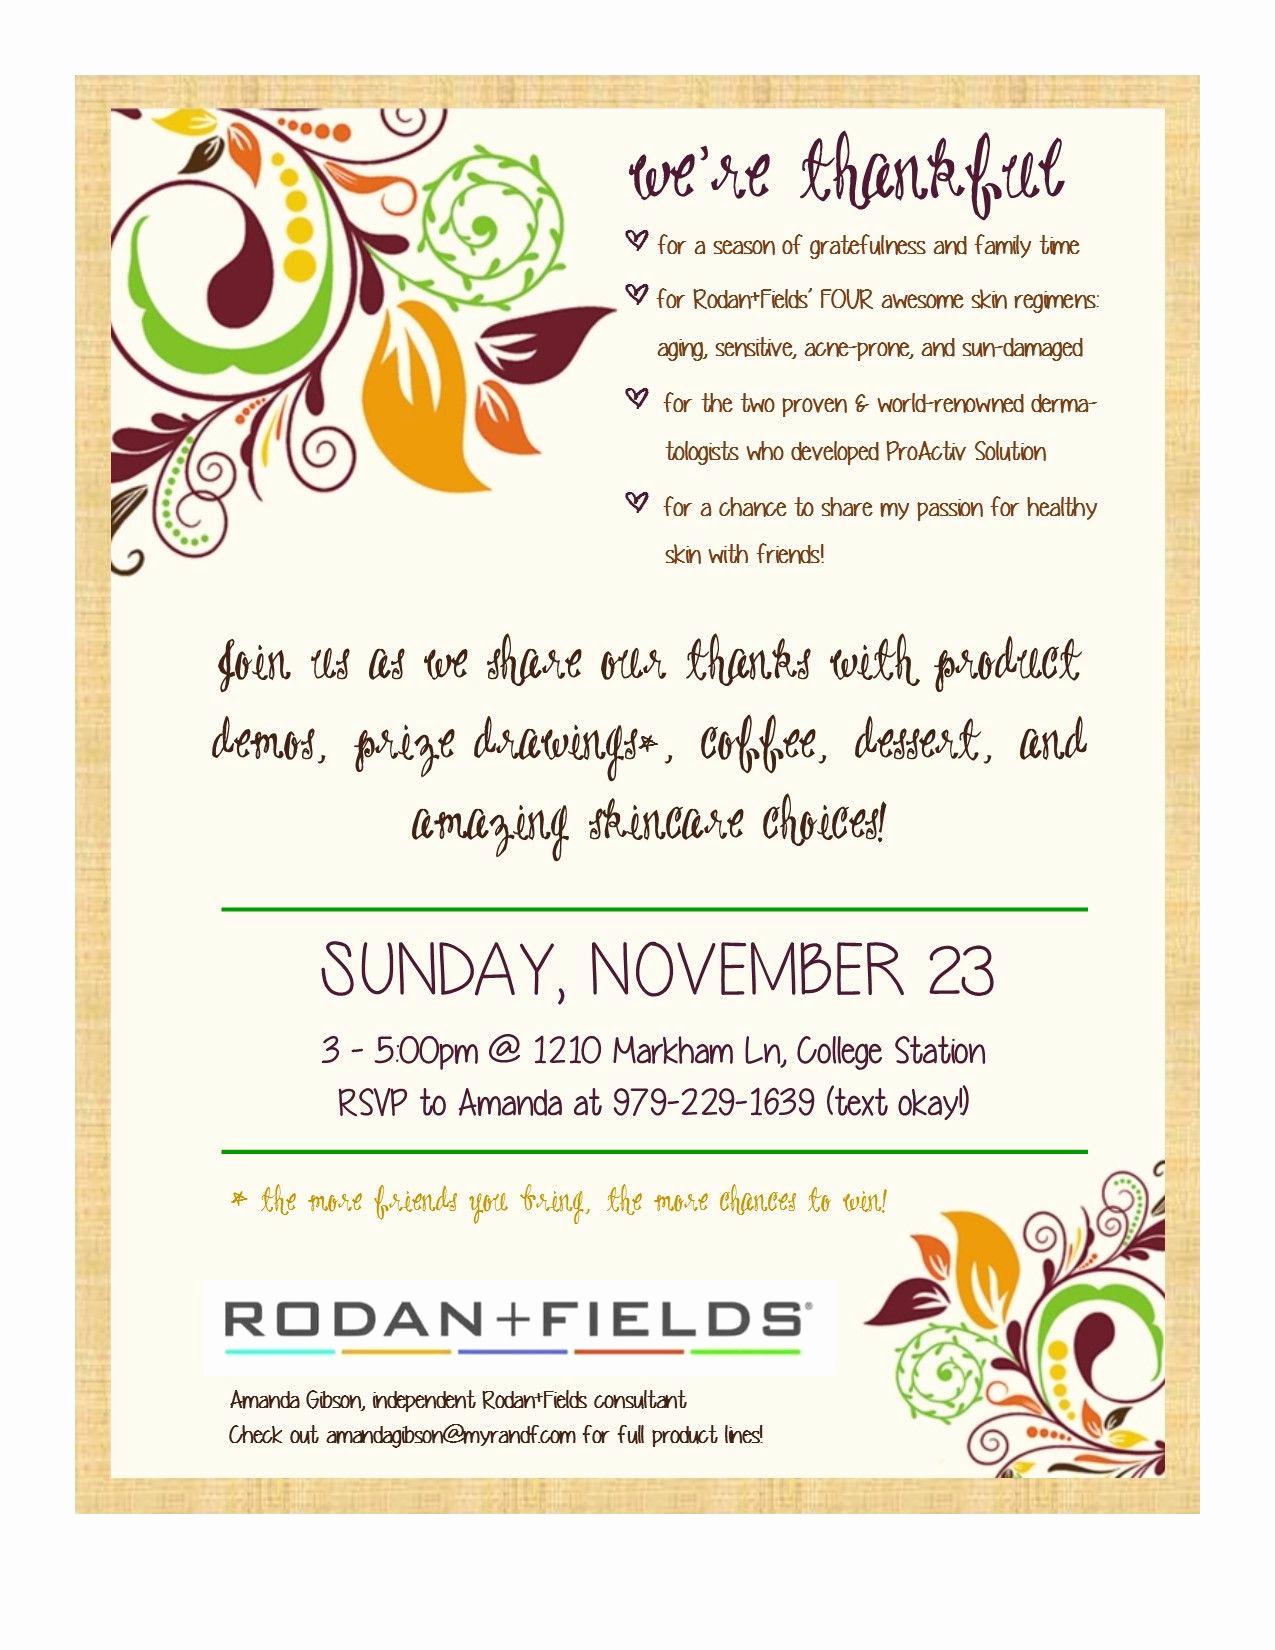 Rodan and Fields Bbl Invitation Lovely My Bbl Invitation Rodan Fields S & Graphics